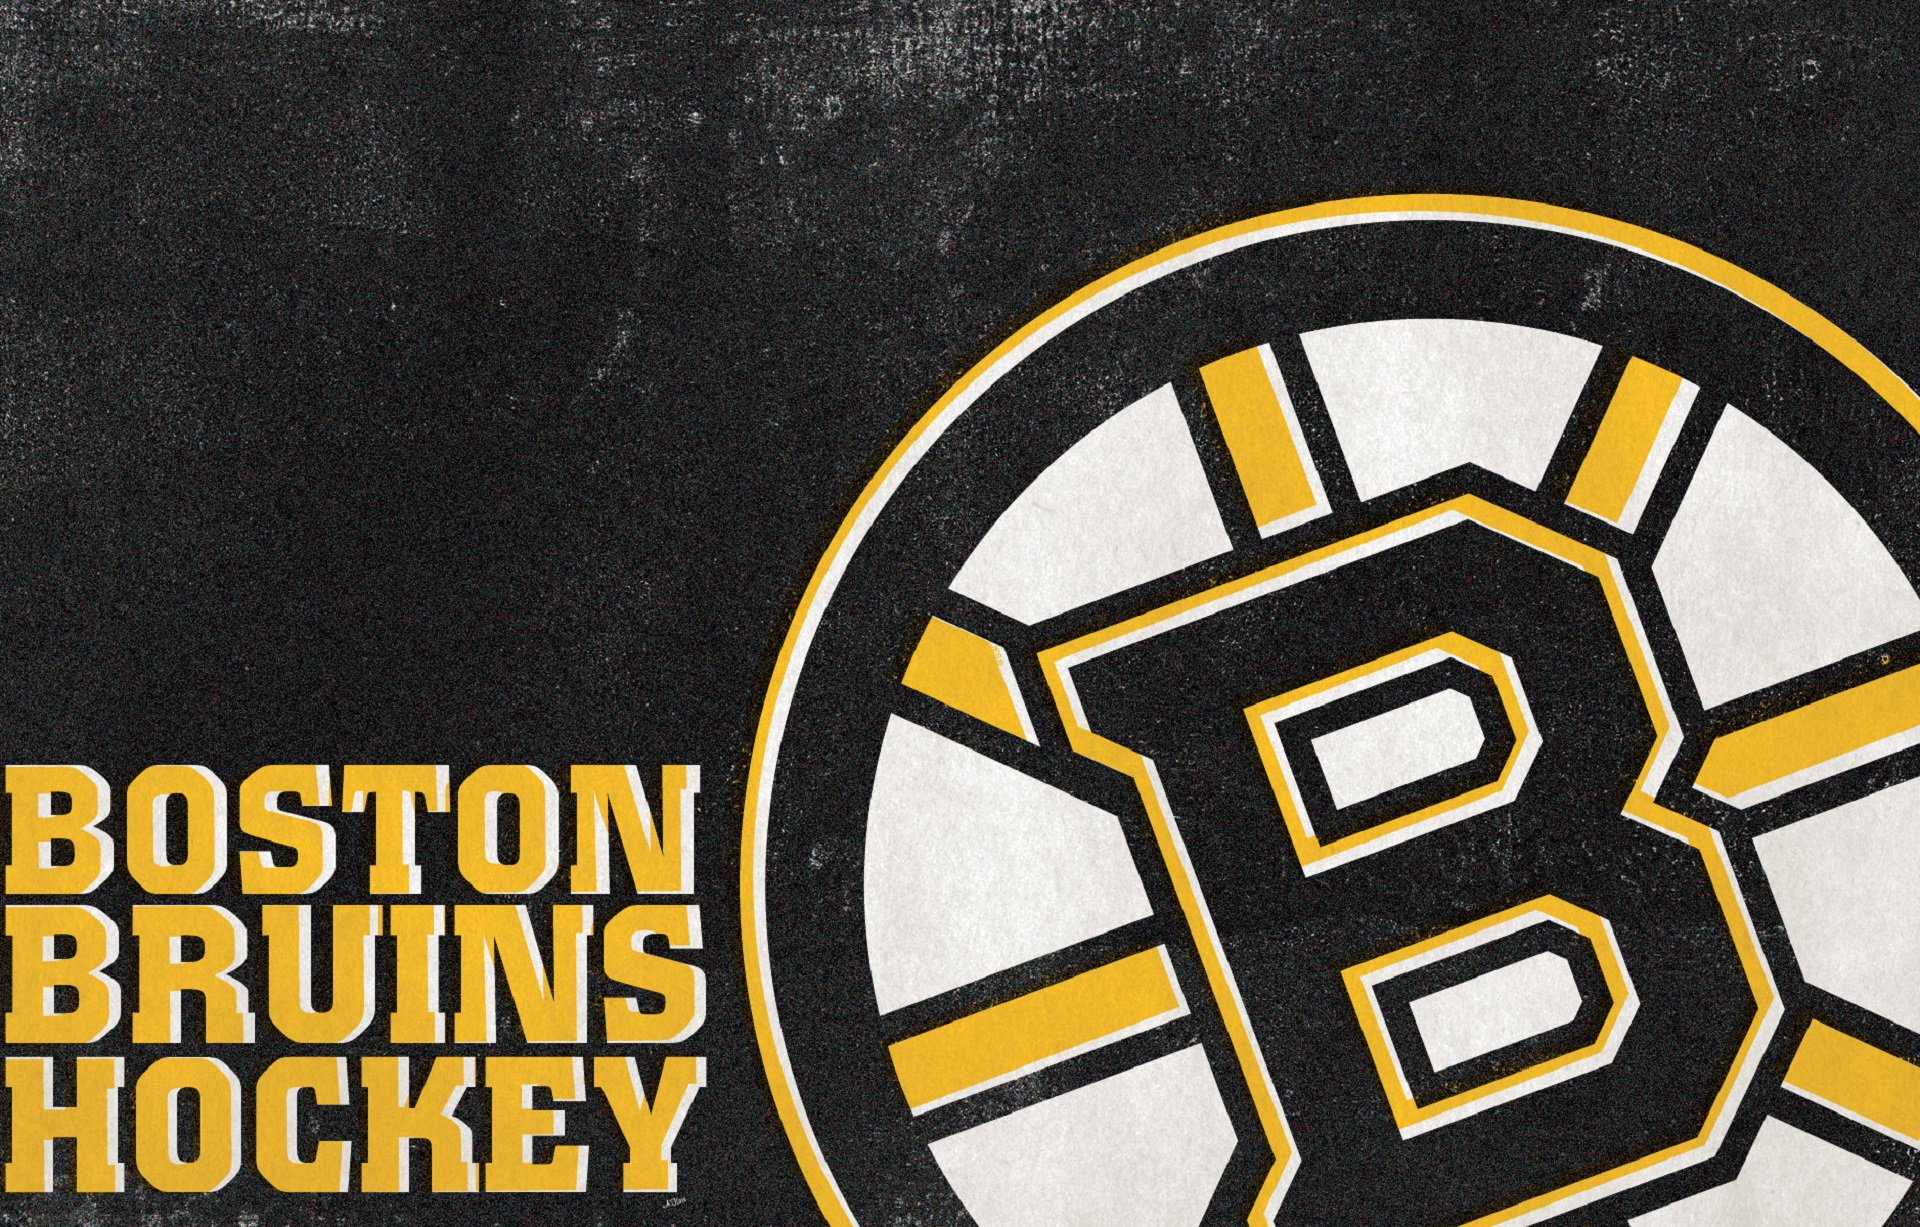 Boston Bruins Background